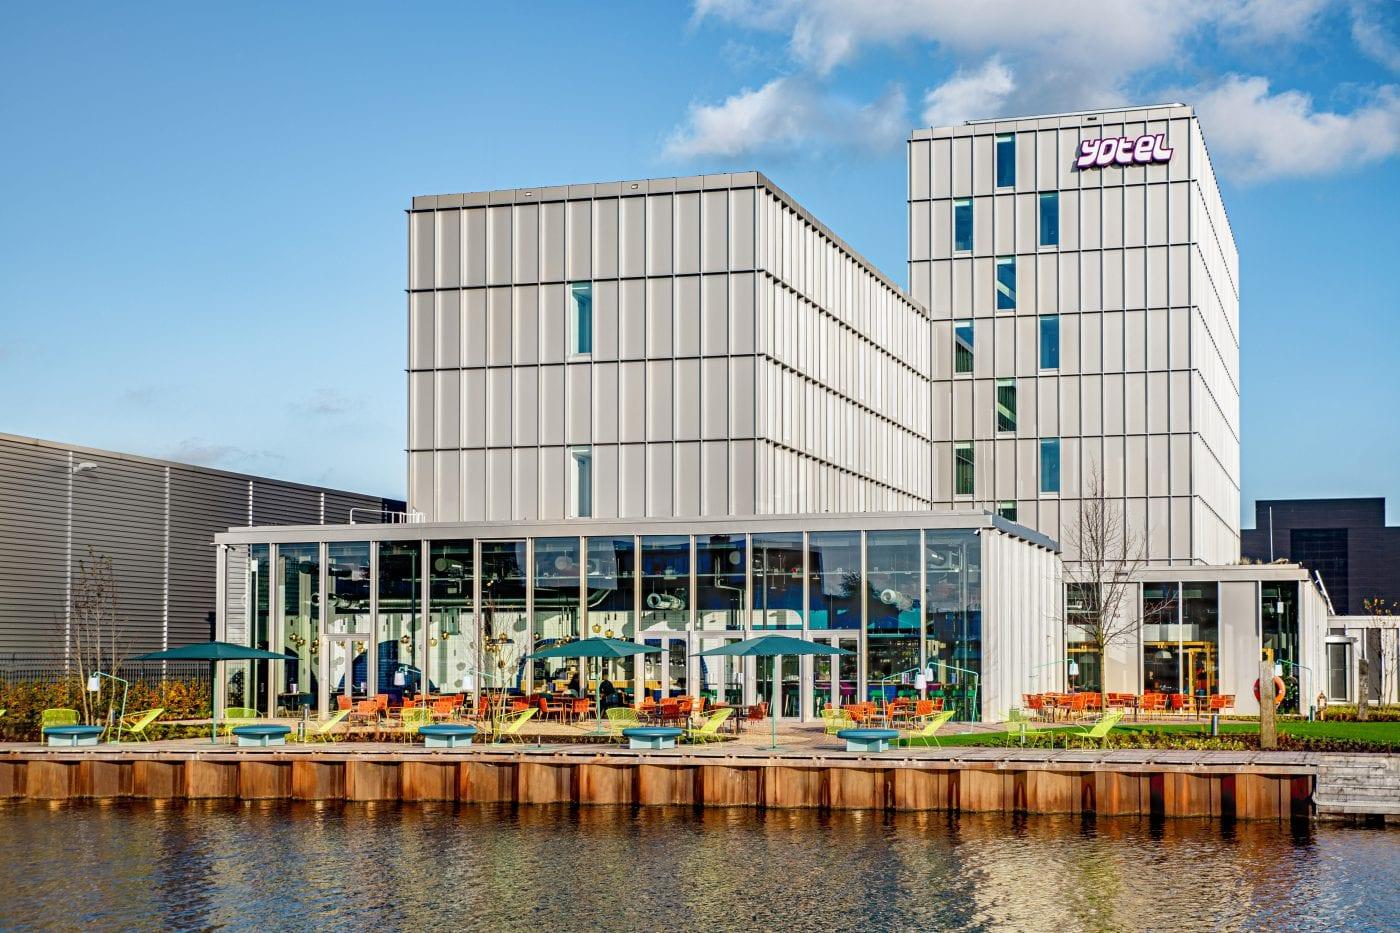 Yotel amsterdam, aluminium gevelbekleding, modulaire bouw, stapelbouw, stapelbouwkunde